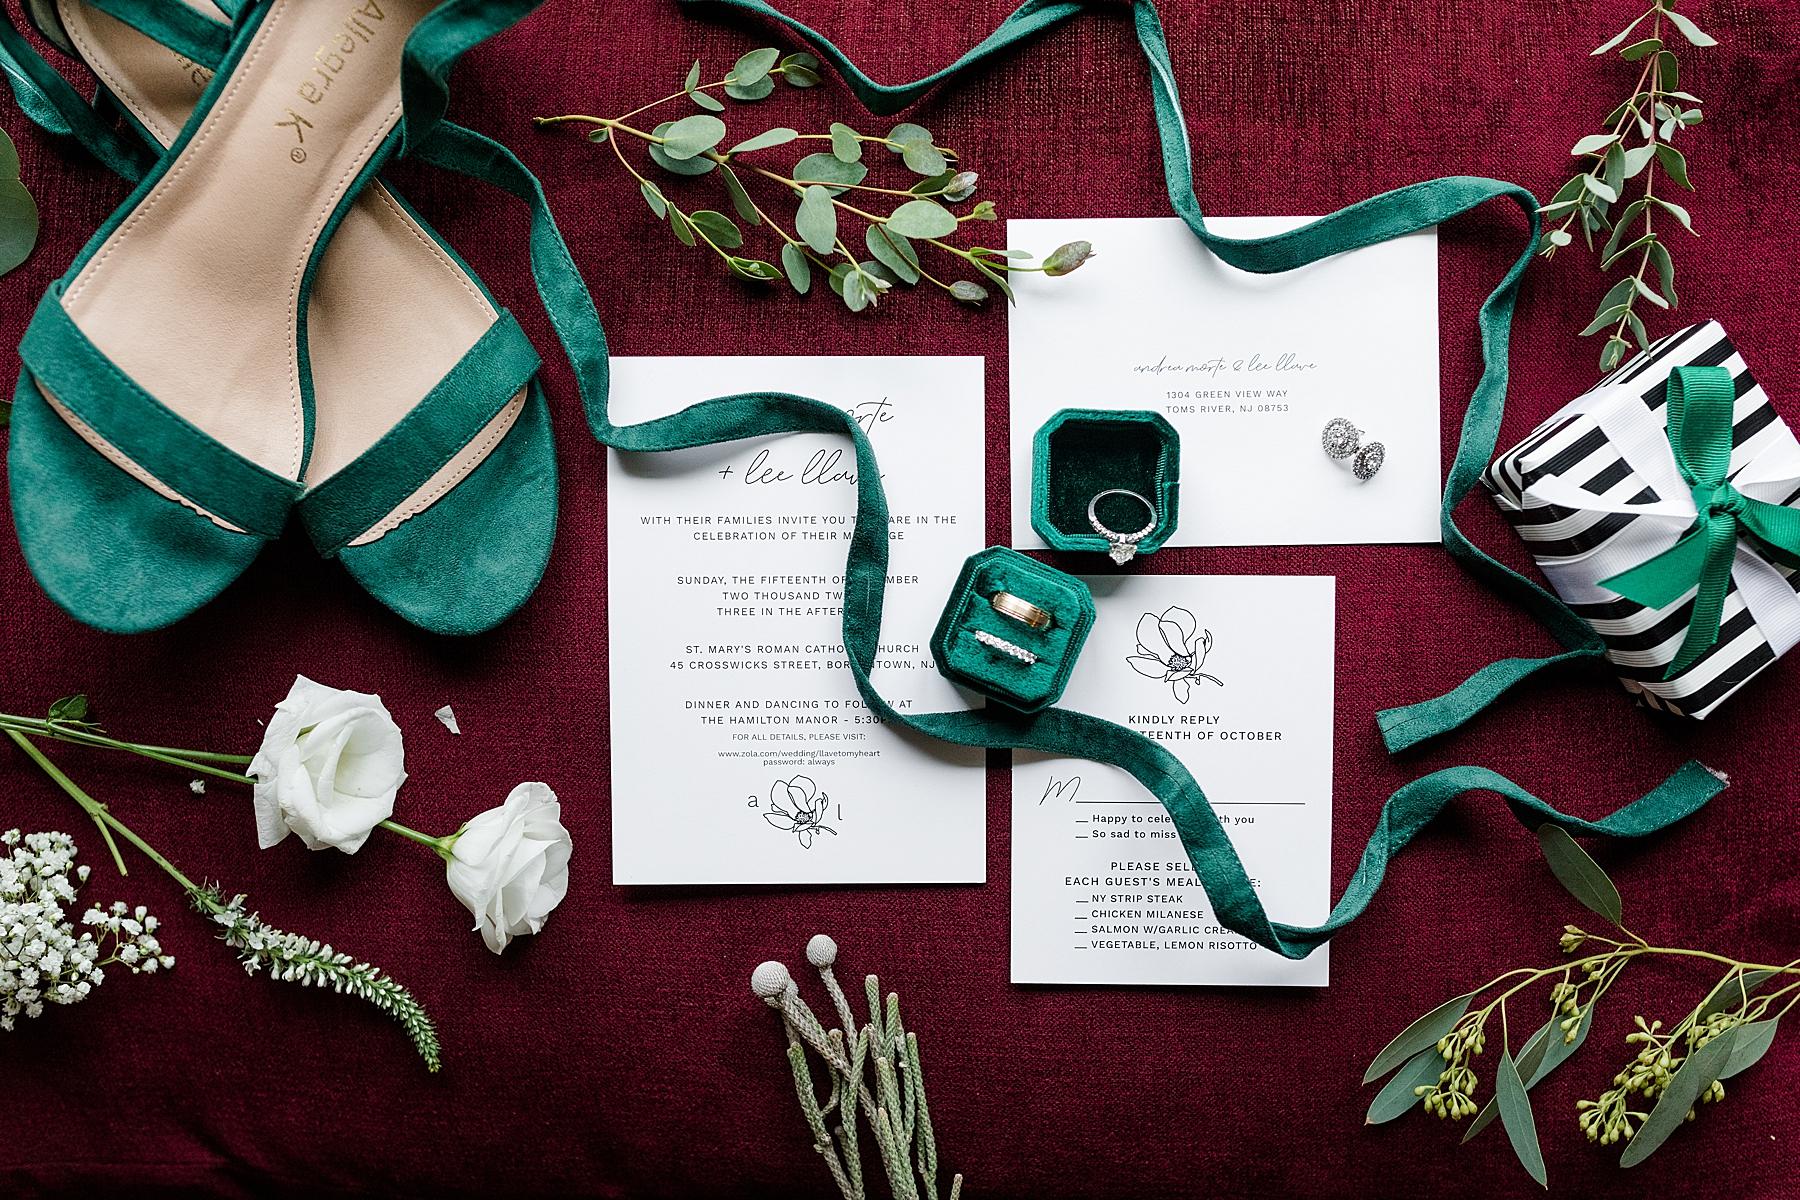 Wedding Cards & Rings Hamilton Manor